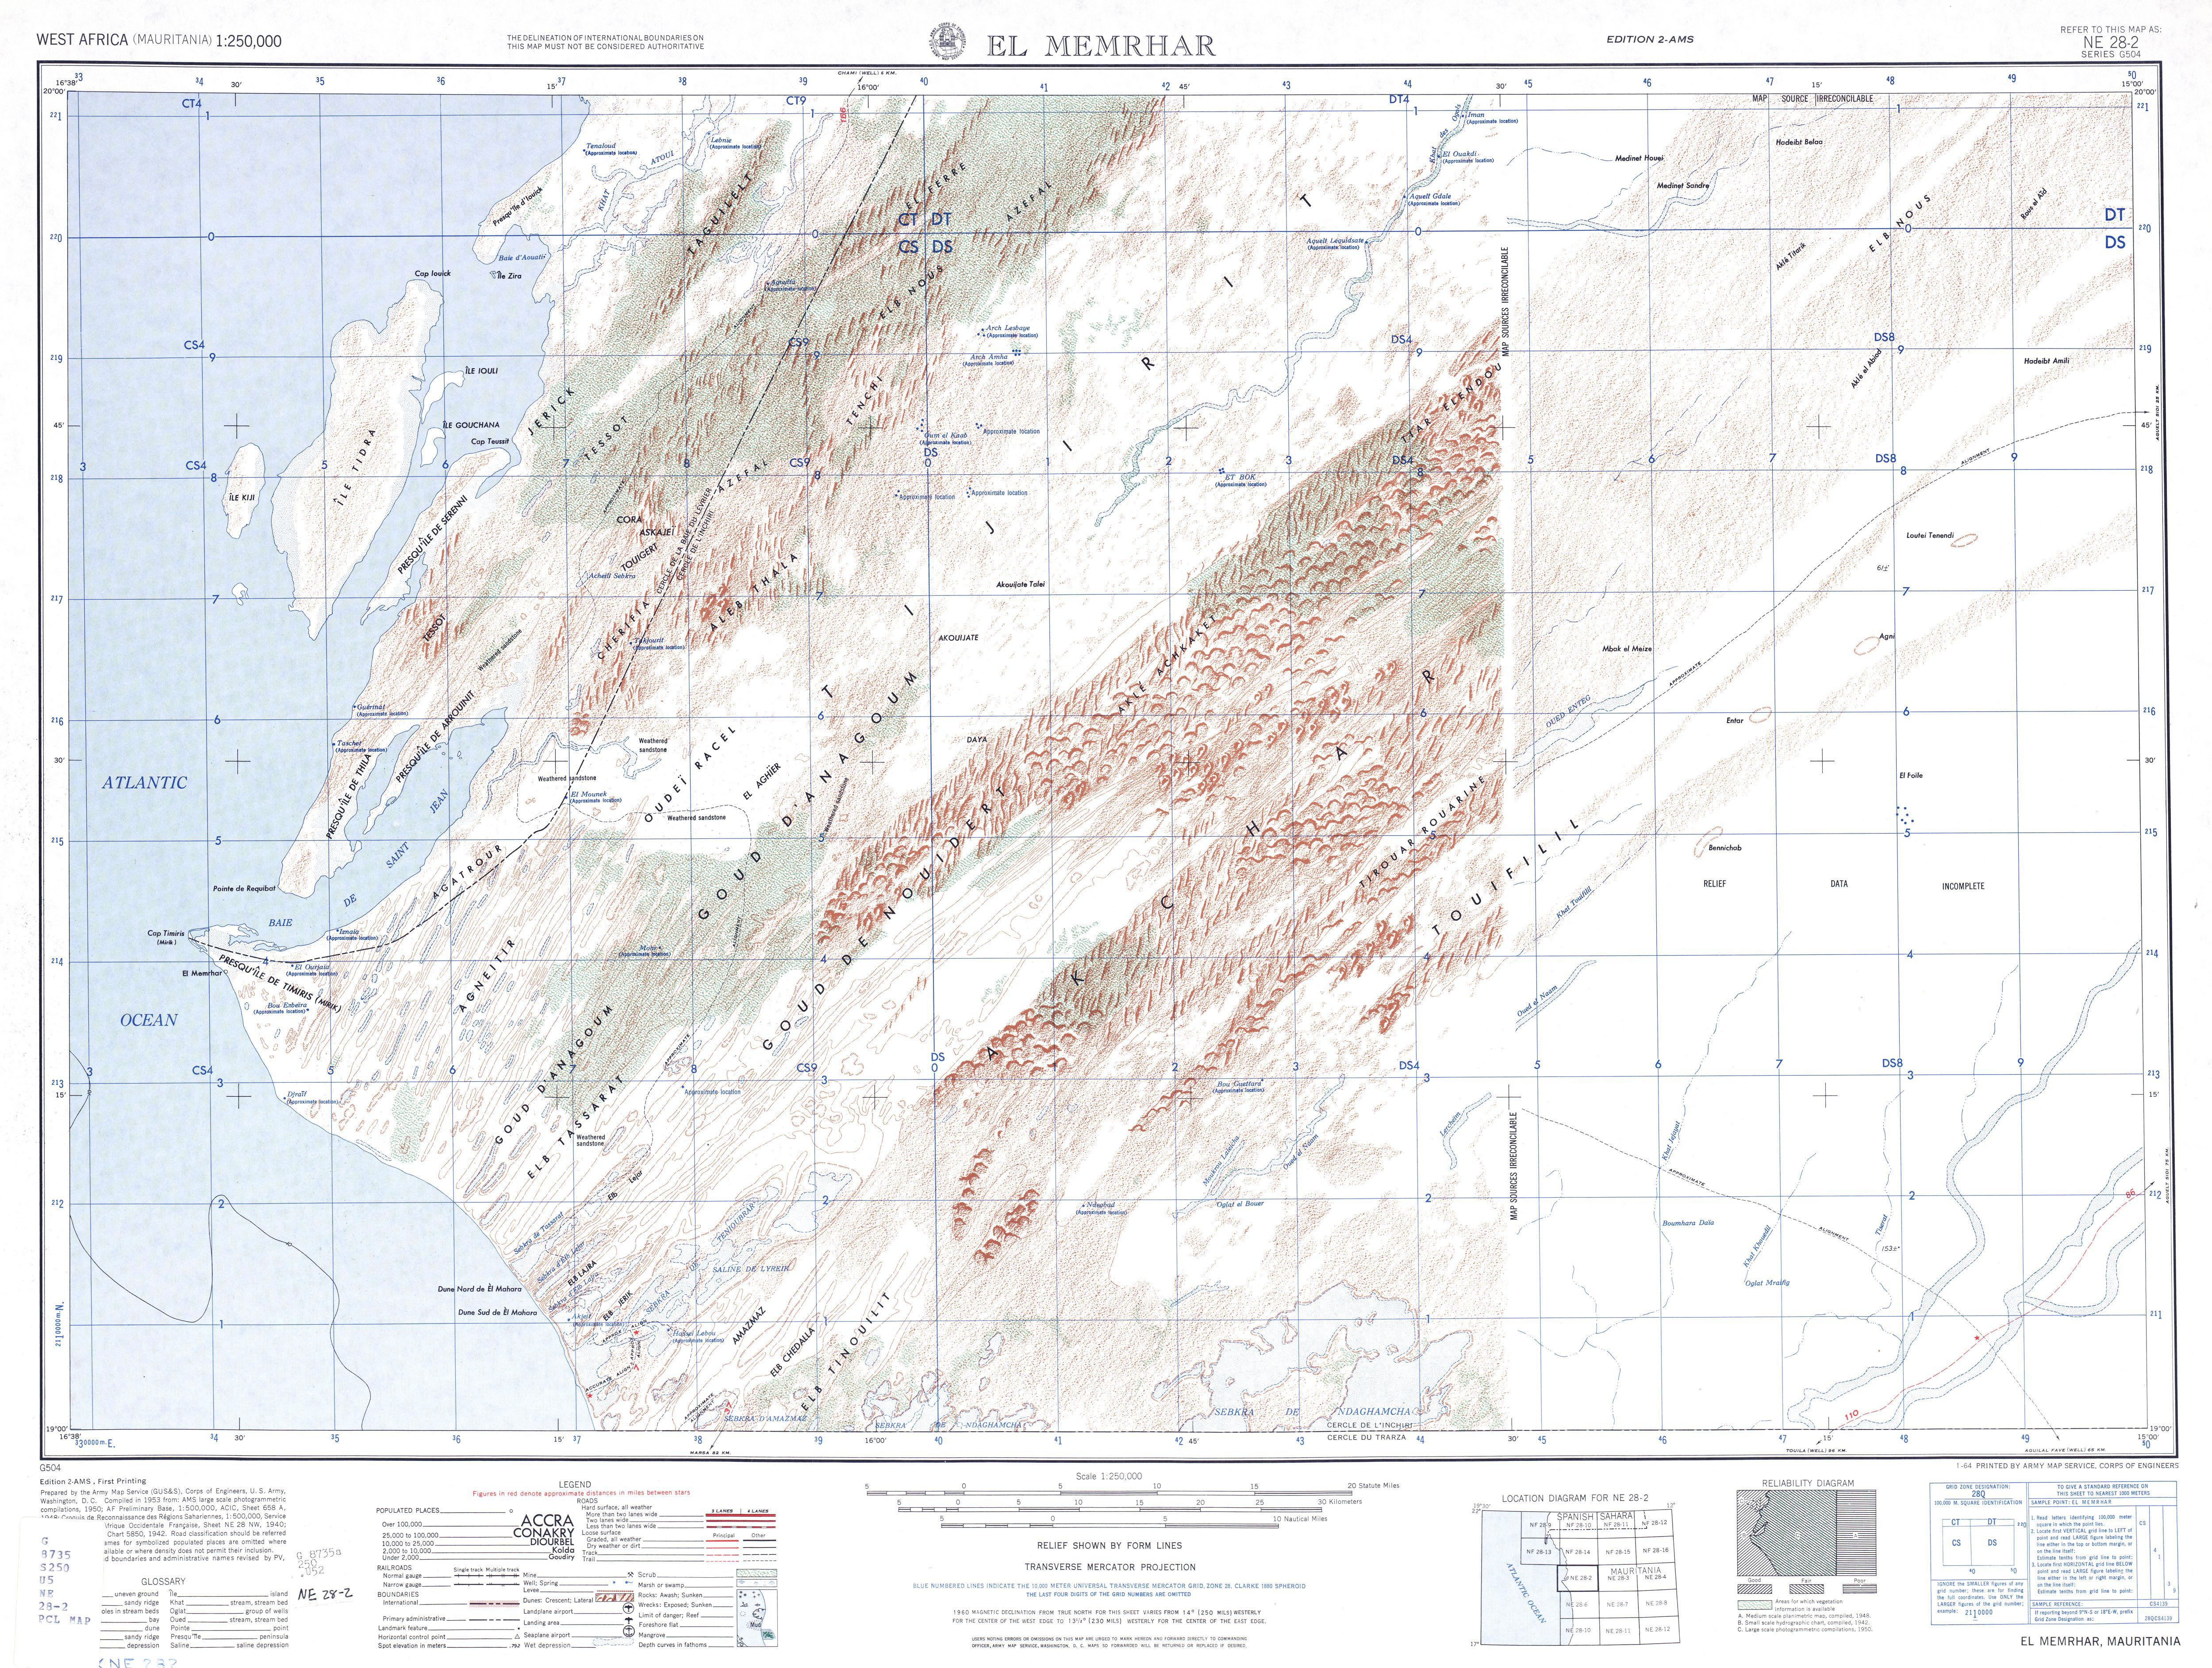 El Memrhar Topographic Map Sheet, Western Africa 1955